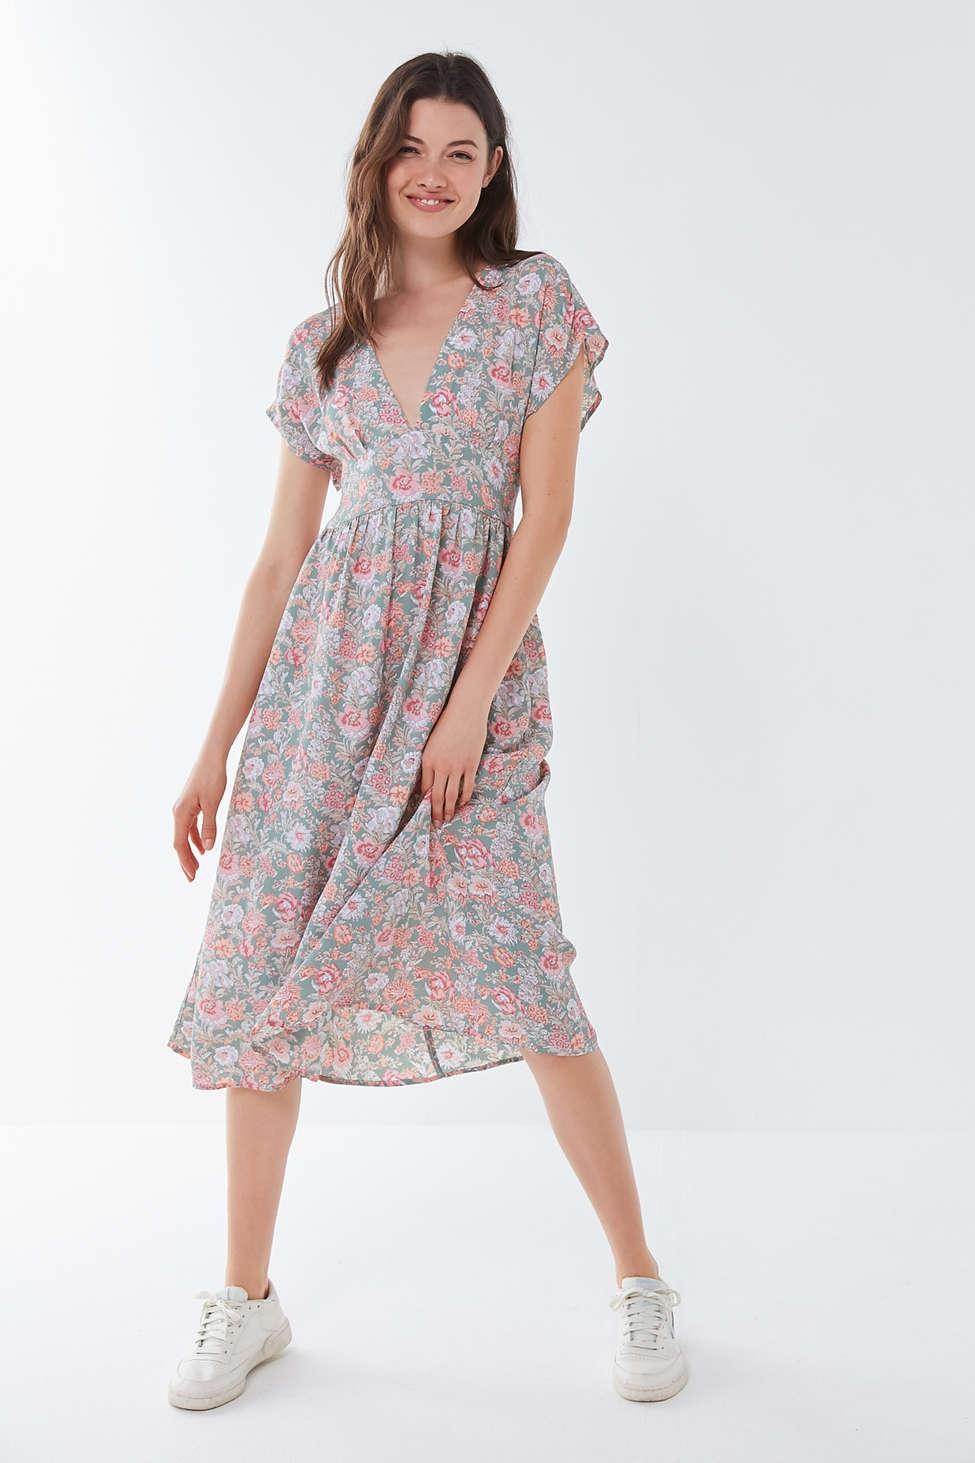 66eda1d0425e8 Urban Renewal. Women's Remnants Floral Rayon Deep V Midi Dress